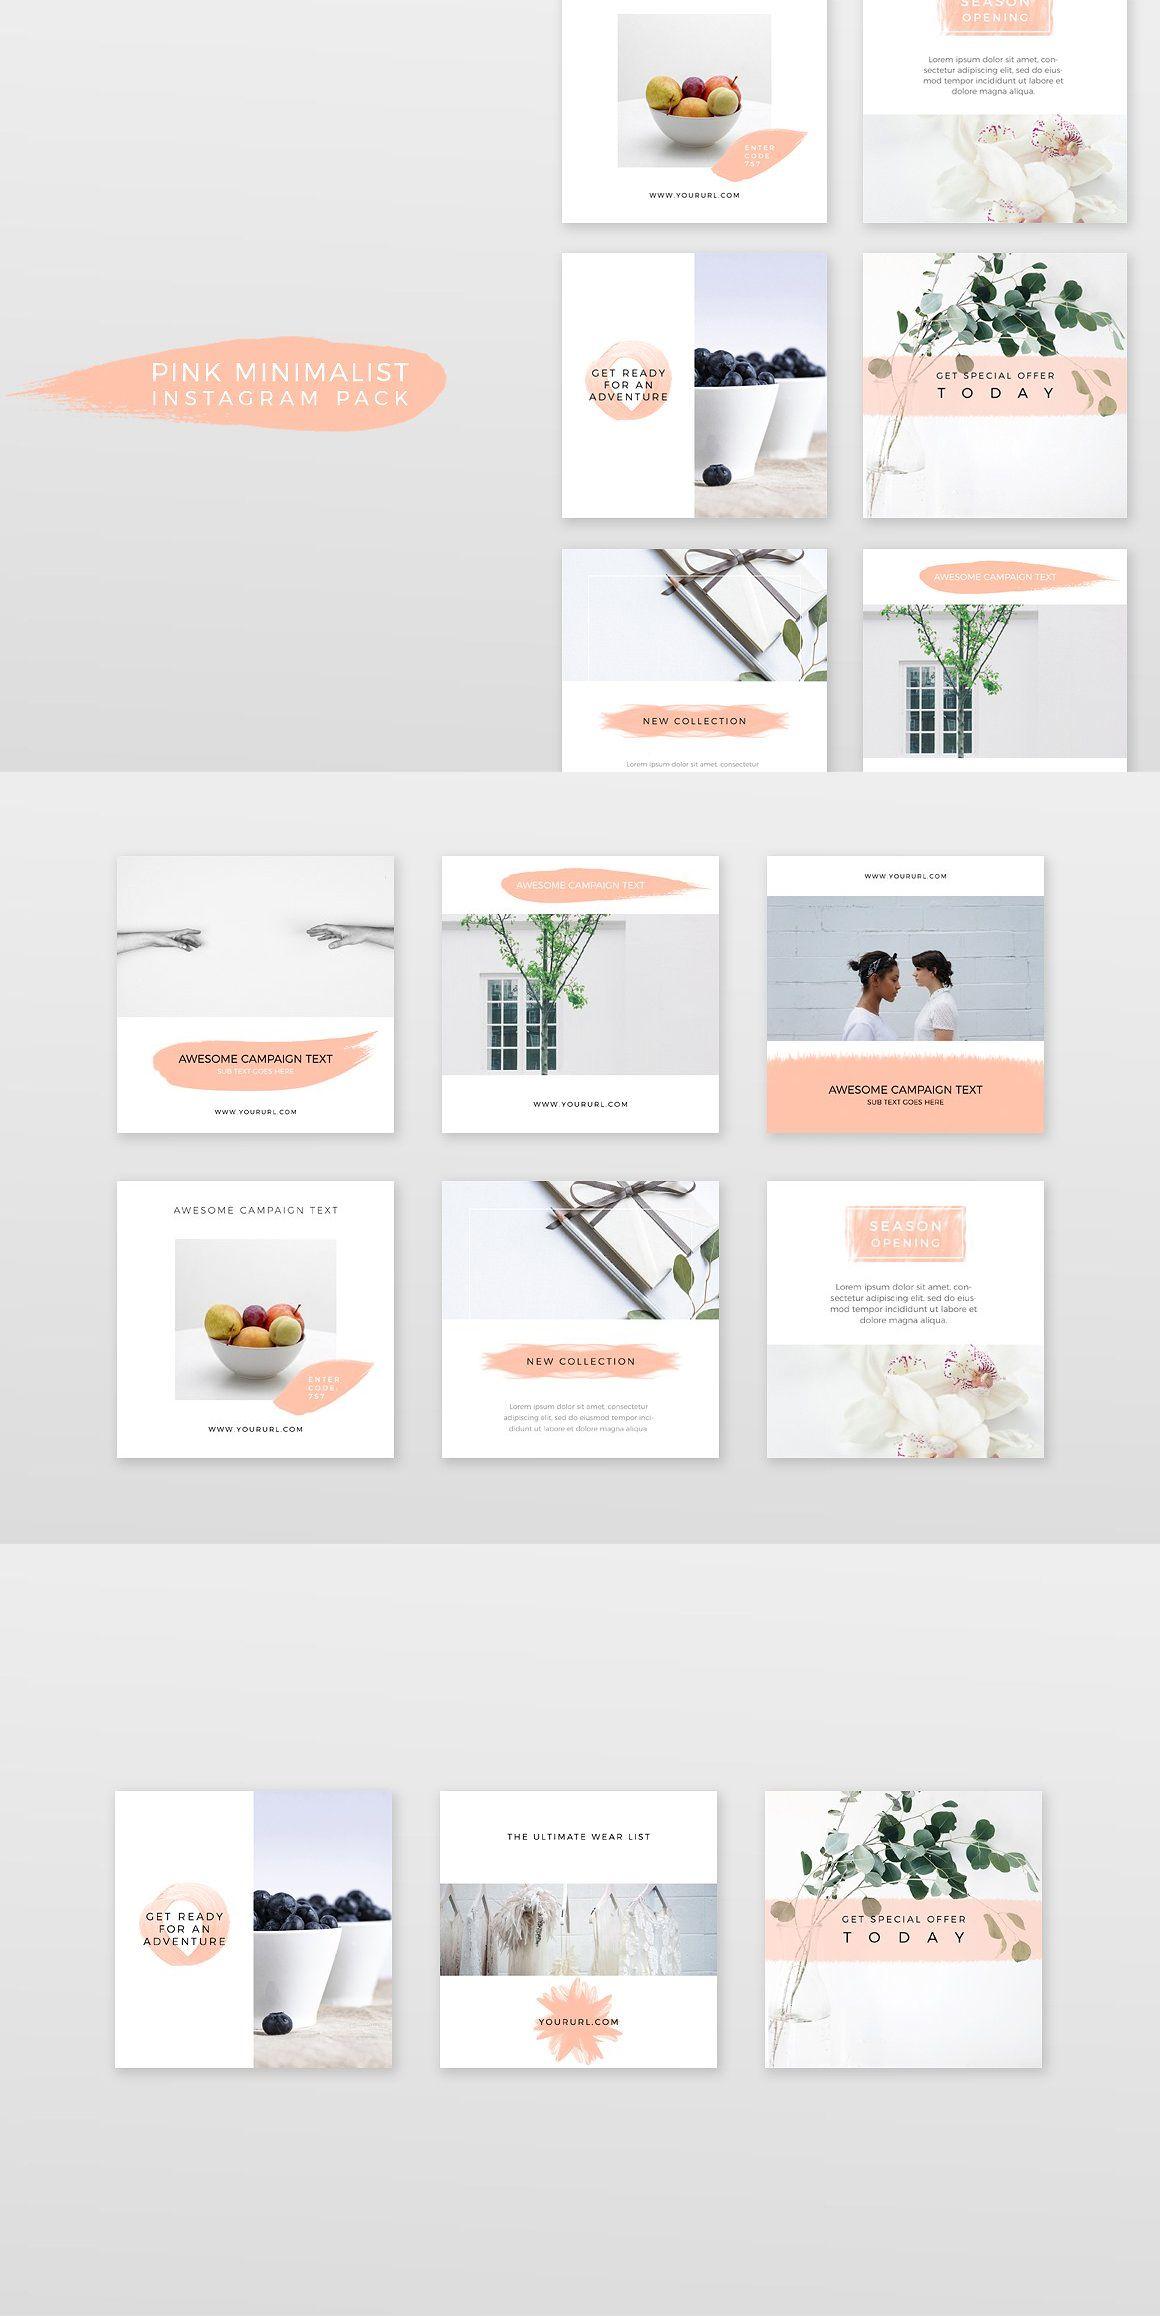 Pink Minimalist Instagram Pack Planirovshik Bloga Veb Dizajn